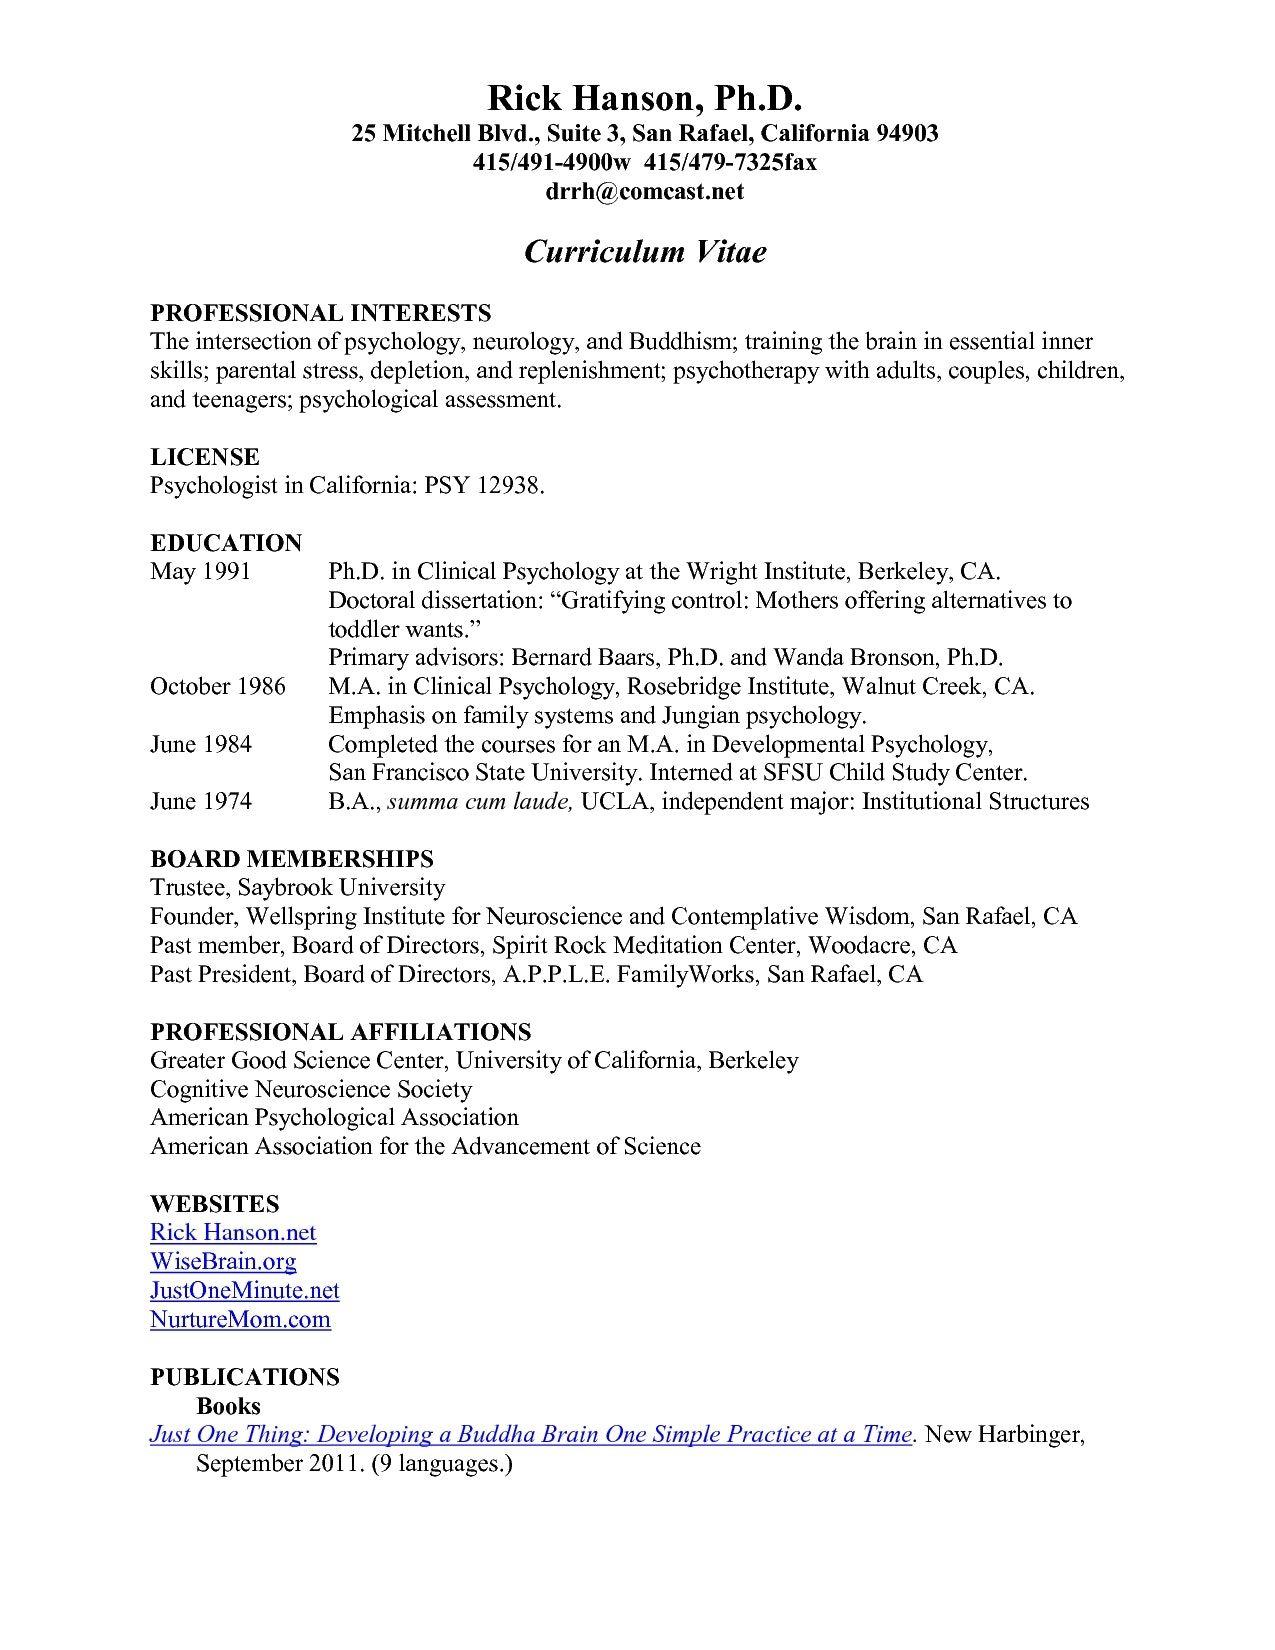 Resume Templates Reddit 2018 #reddit #resume #ResumeTemplates ...